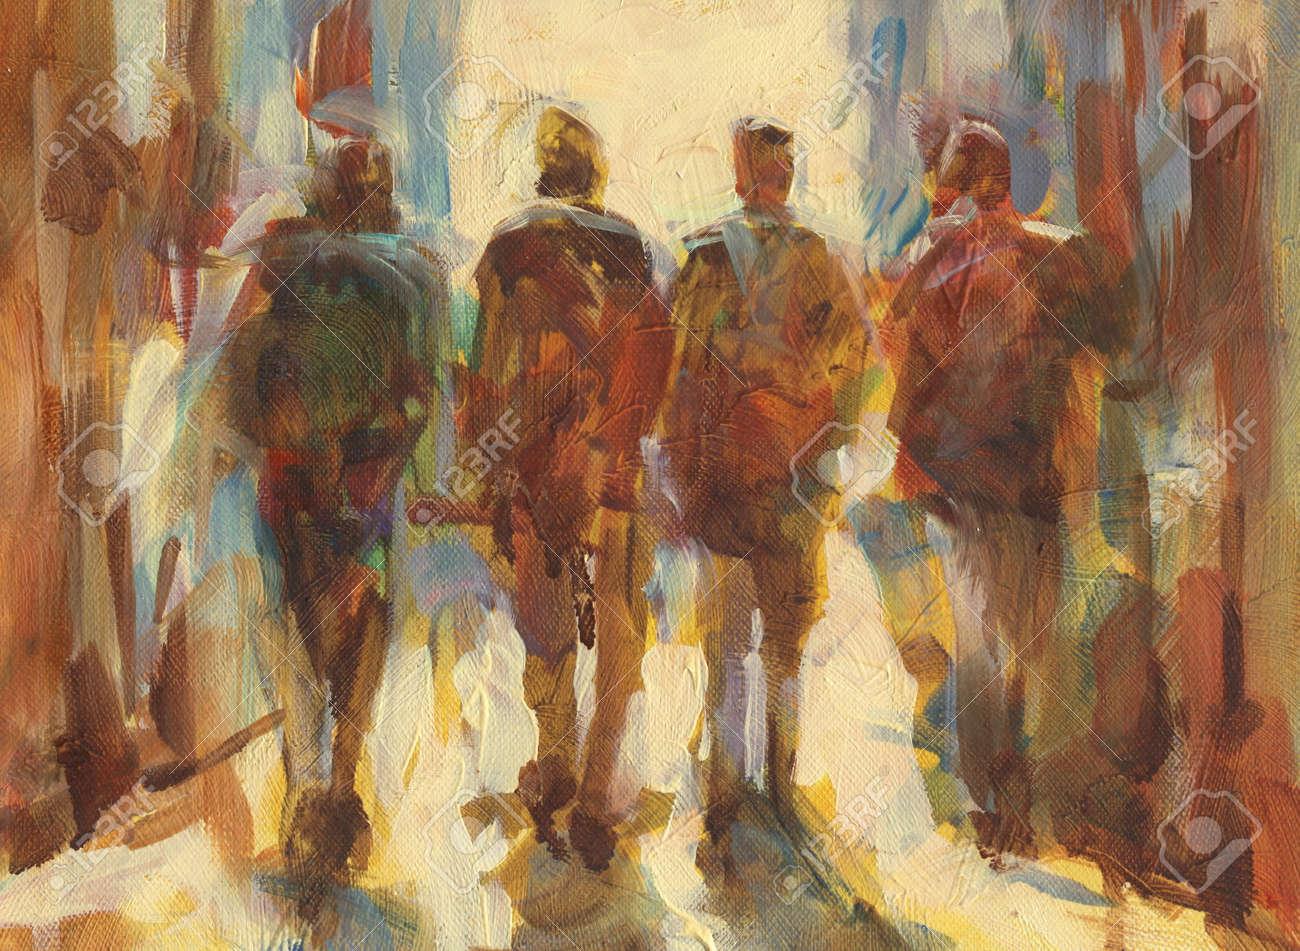 Walking People Handmade Oil Painting On Canvas